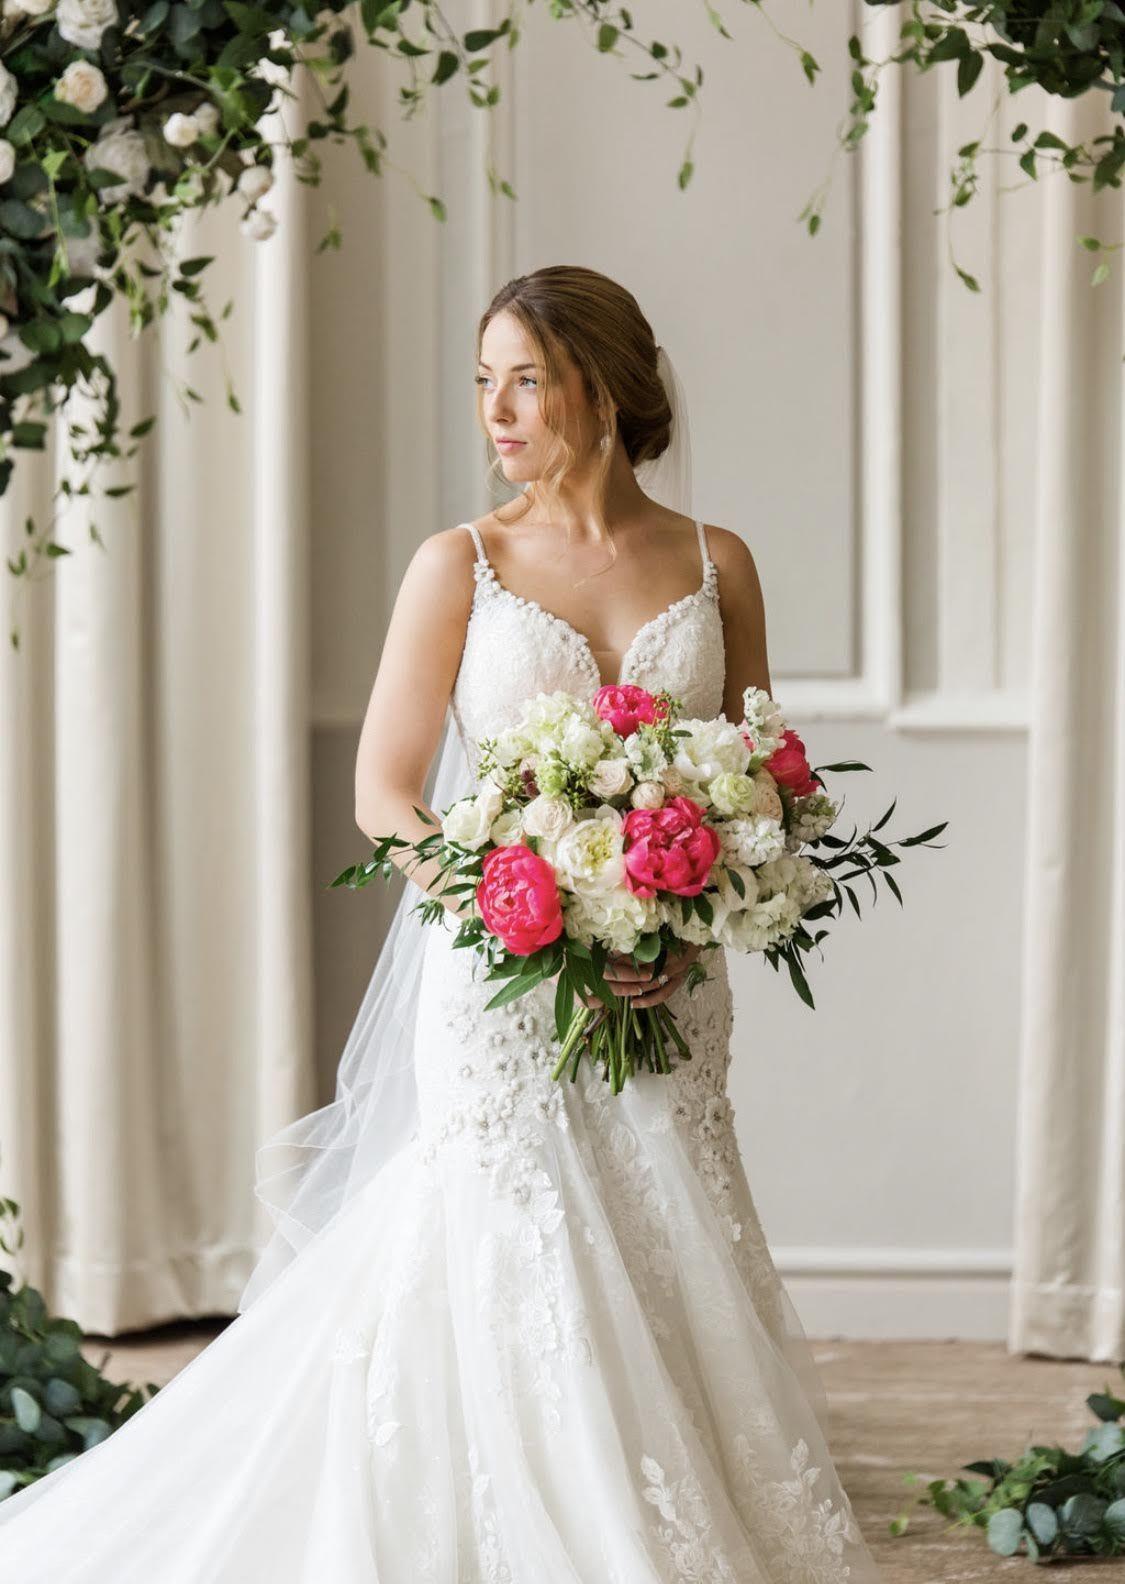 Pin By The Wedding Studio Greenwood On Bridal Photoshoot Couture Bridal Gowns Bridal Photoshoot Wedding Dresses